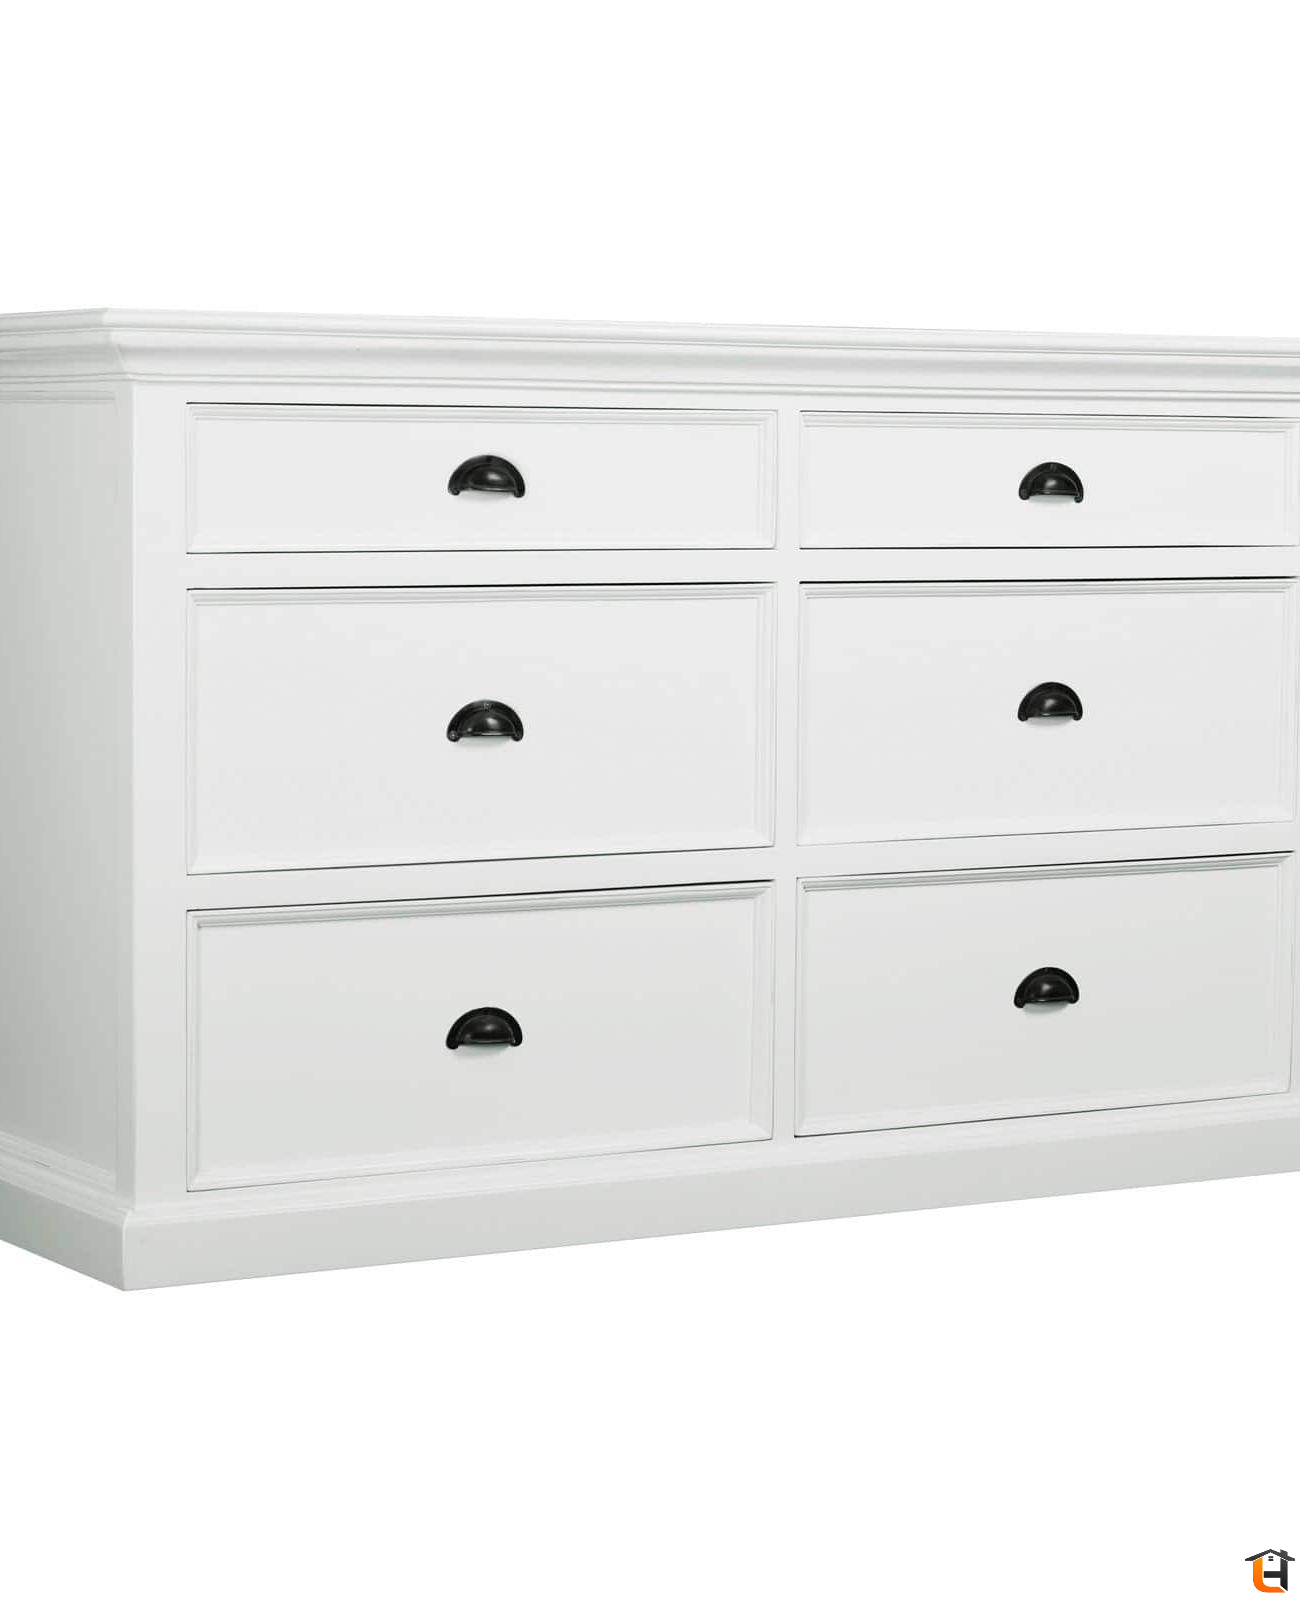 Nova Solo Halifax 6 Drawer Dresser Dresser Dresser Drawers 6 Drawer Dresser Dresser [ 1600 x 1300 Pixel ]